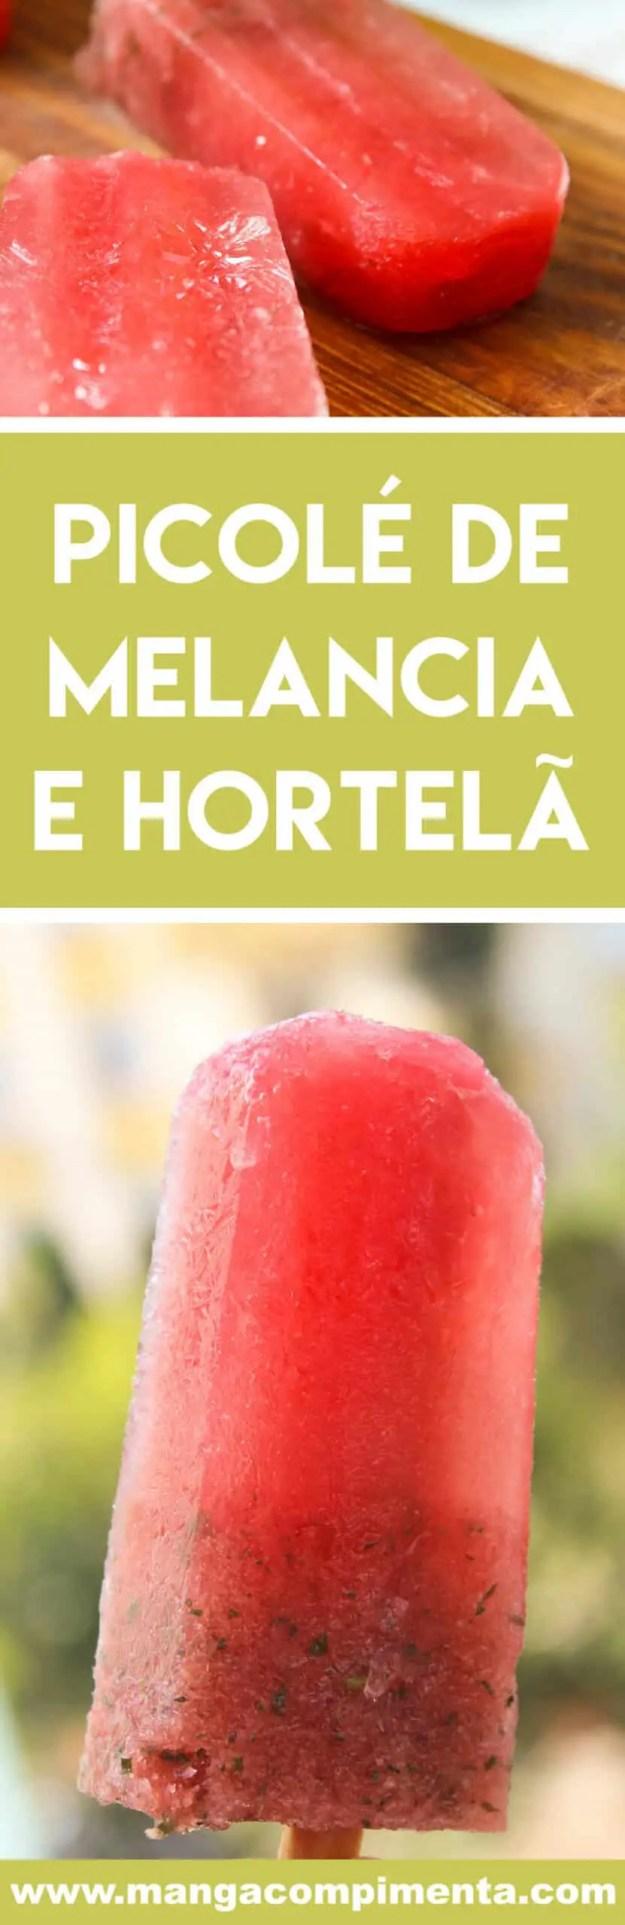 Receita de Picolé de Melancia e Hortelã - fácil de preparar e perfeito para espantar o calor para lá.